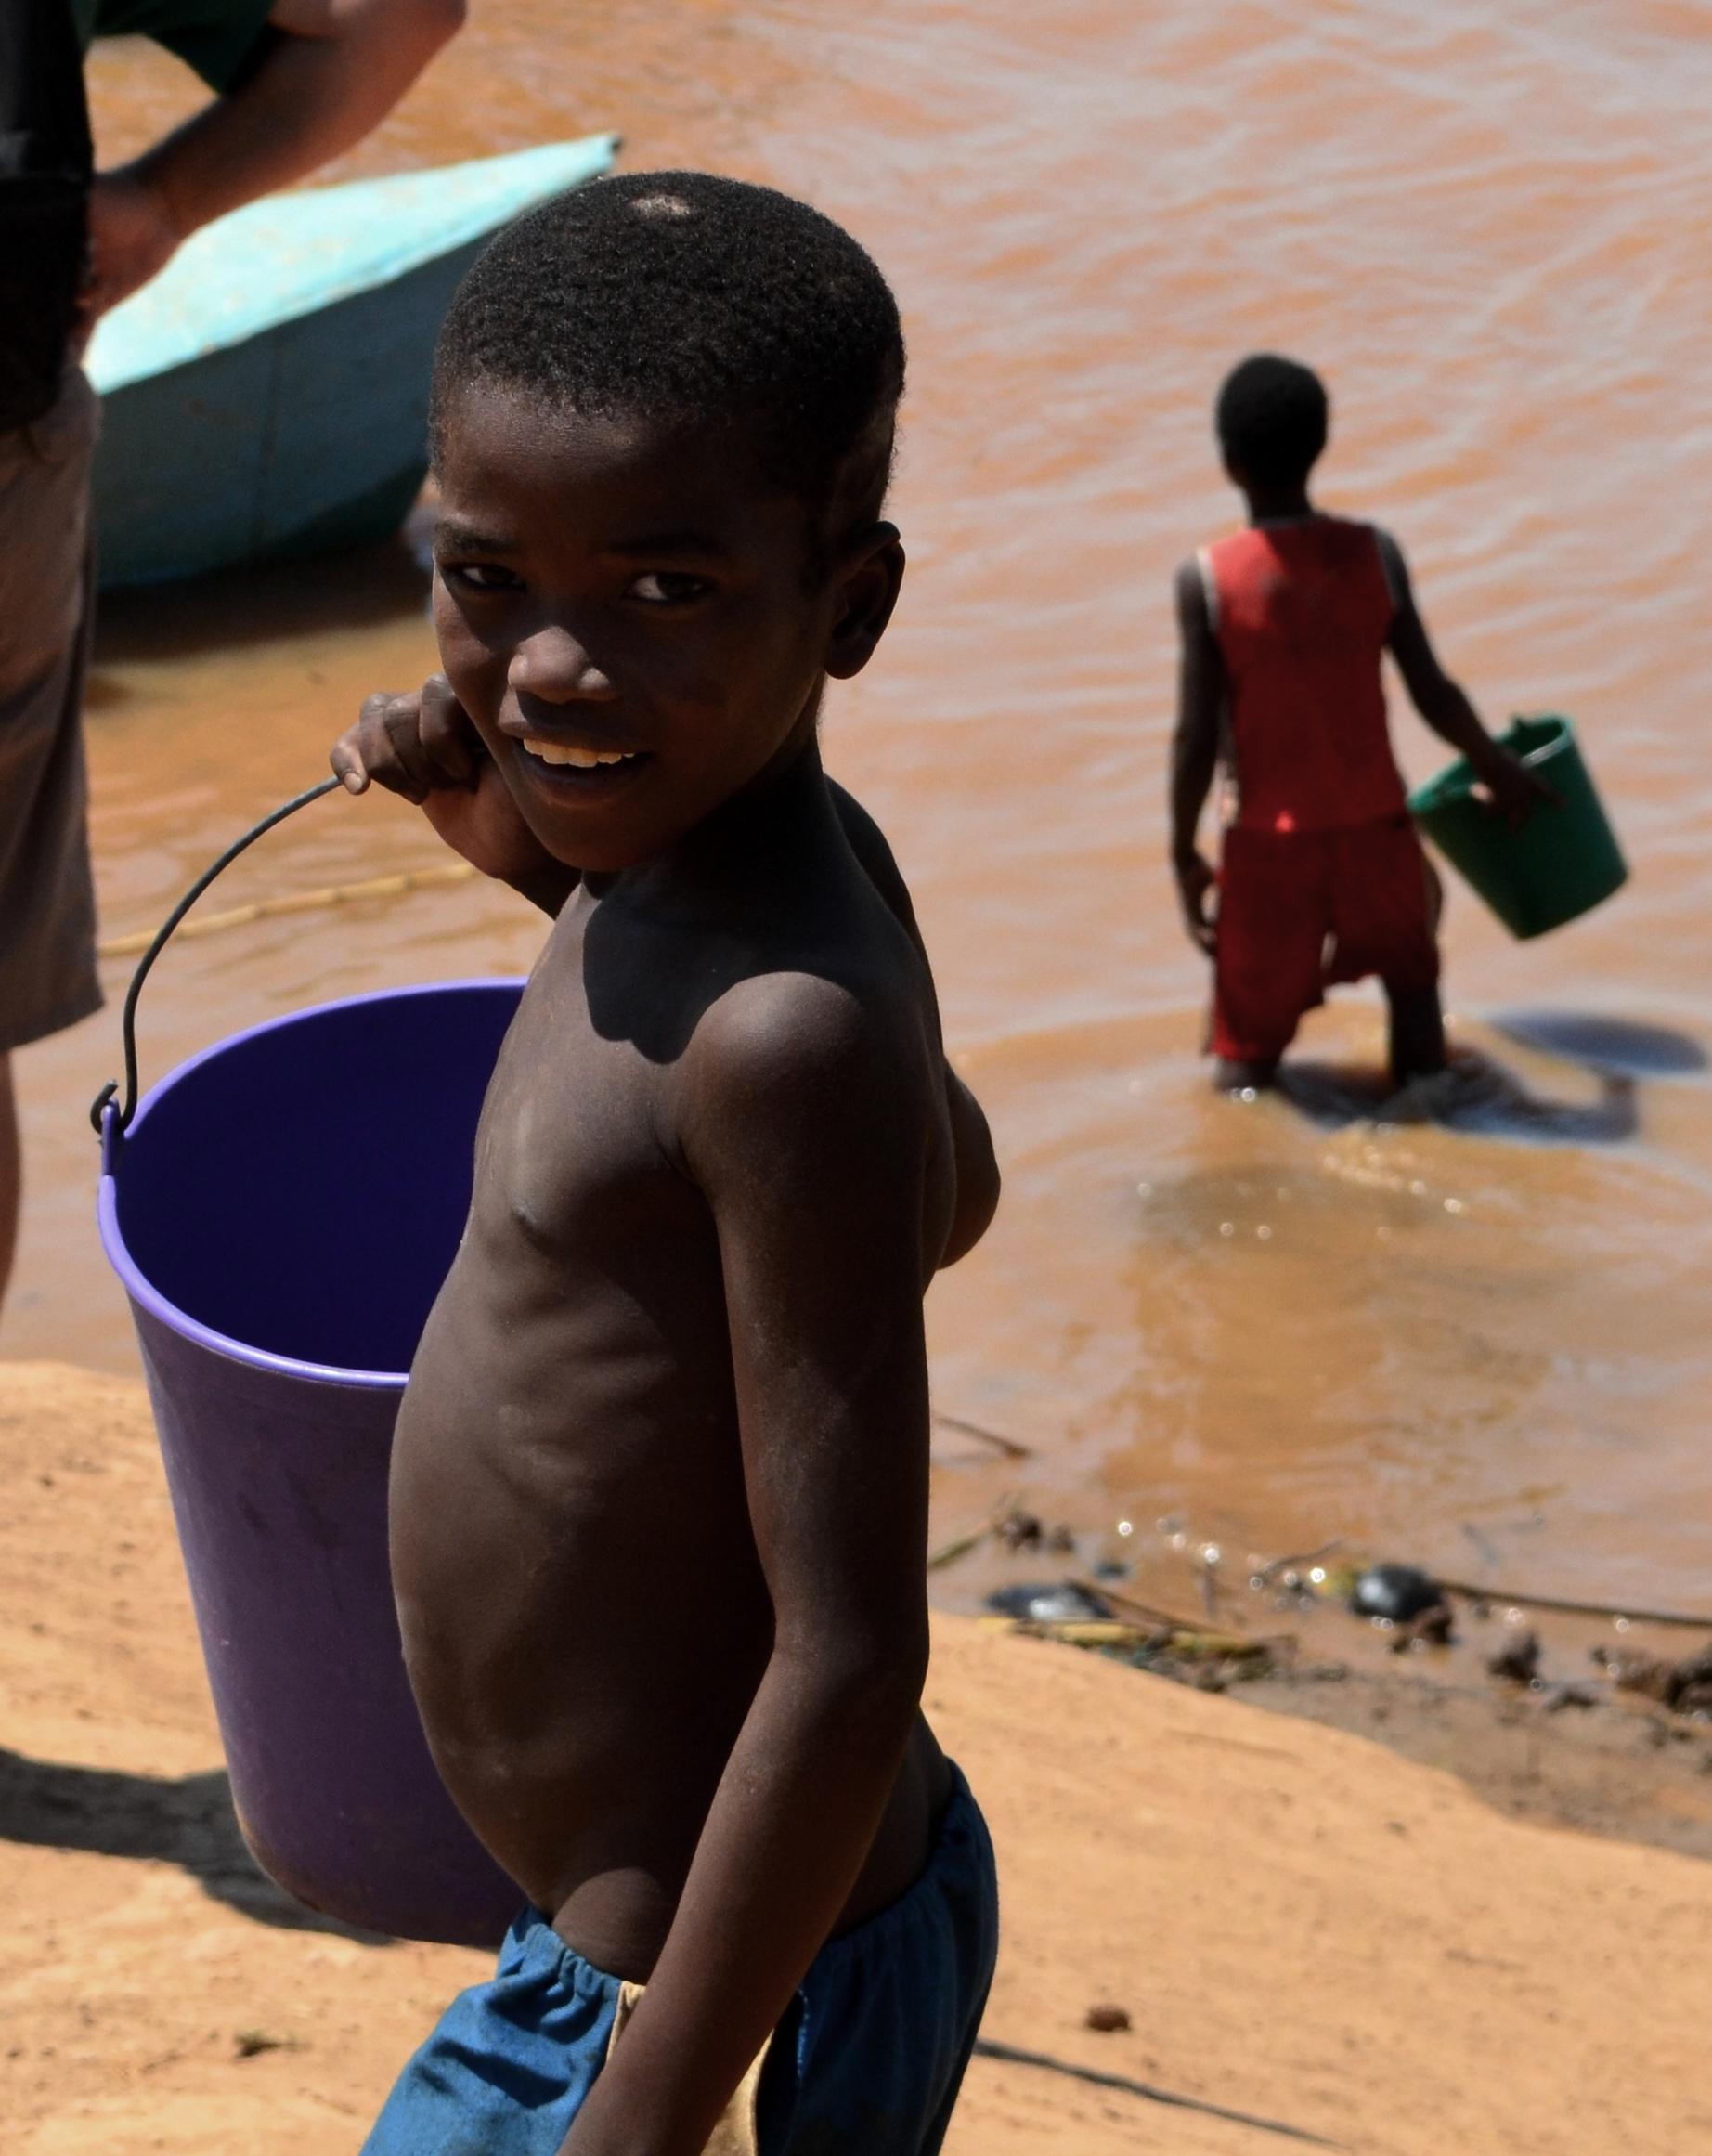 Child in Tsiribihina River in Madagascar